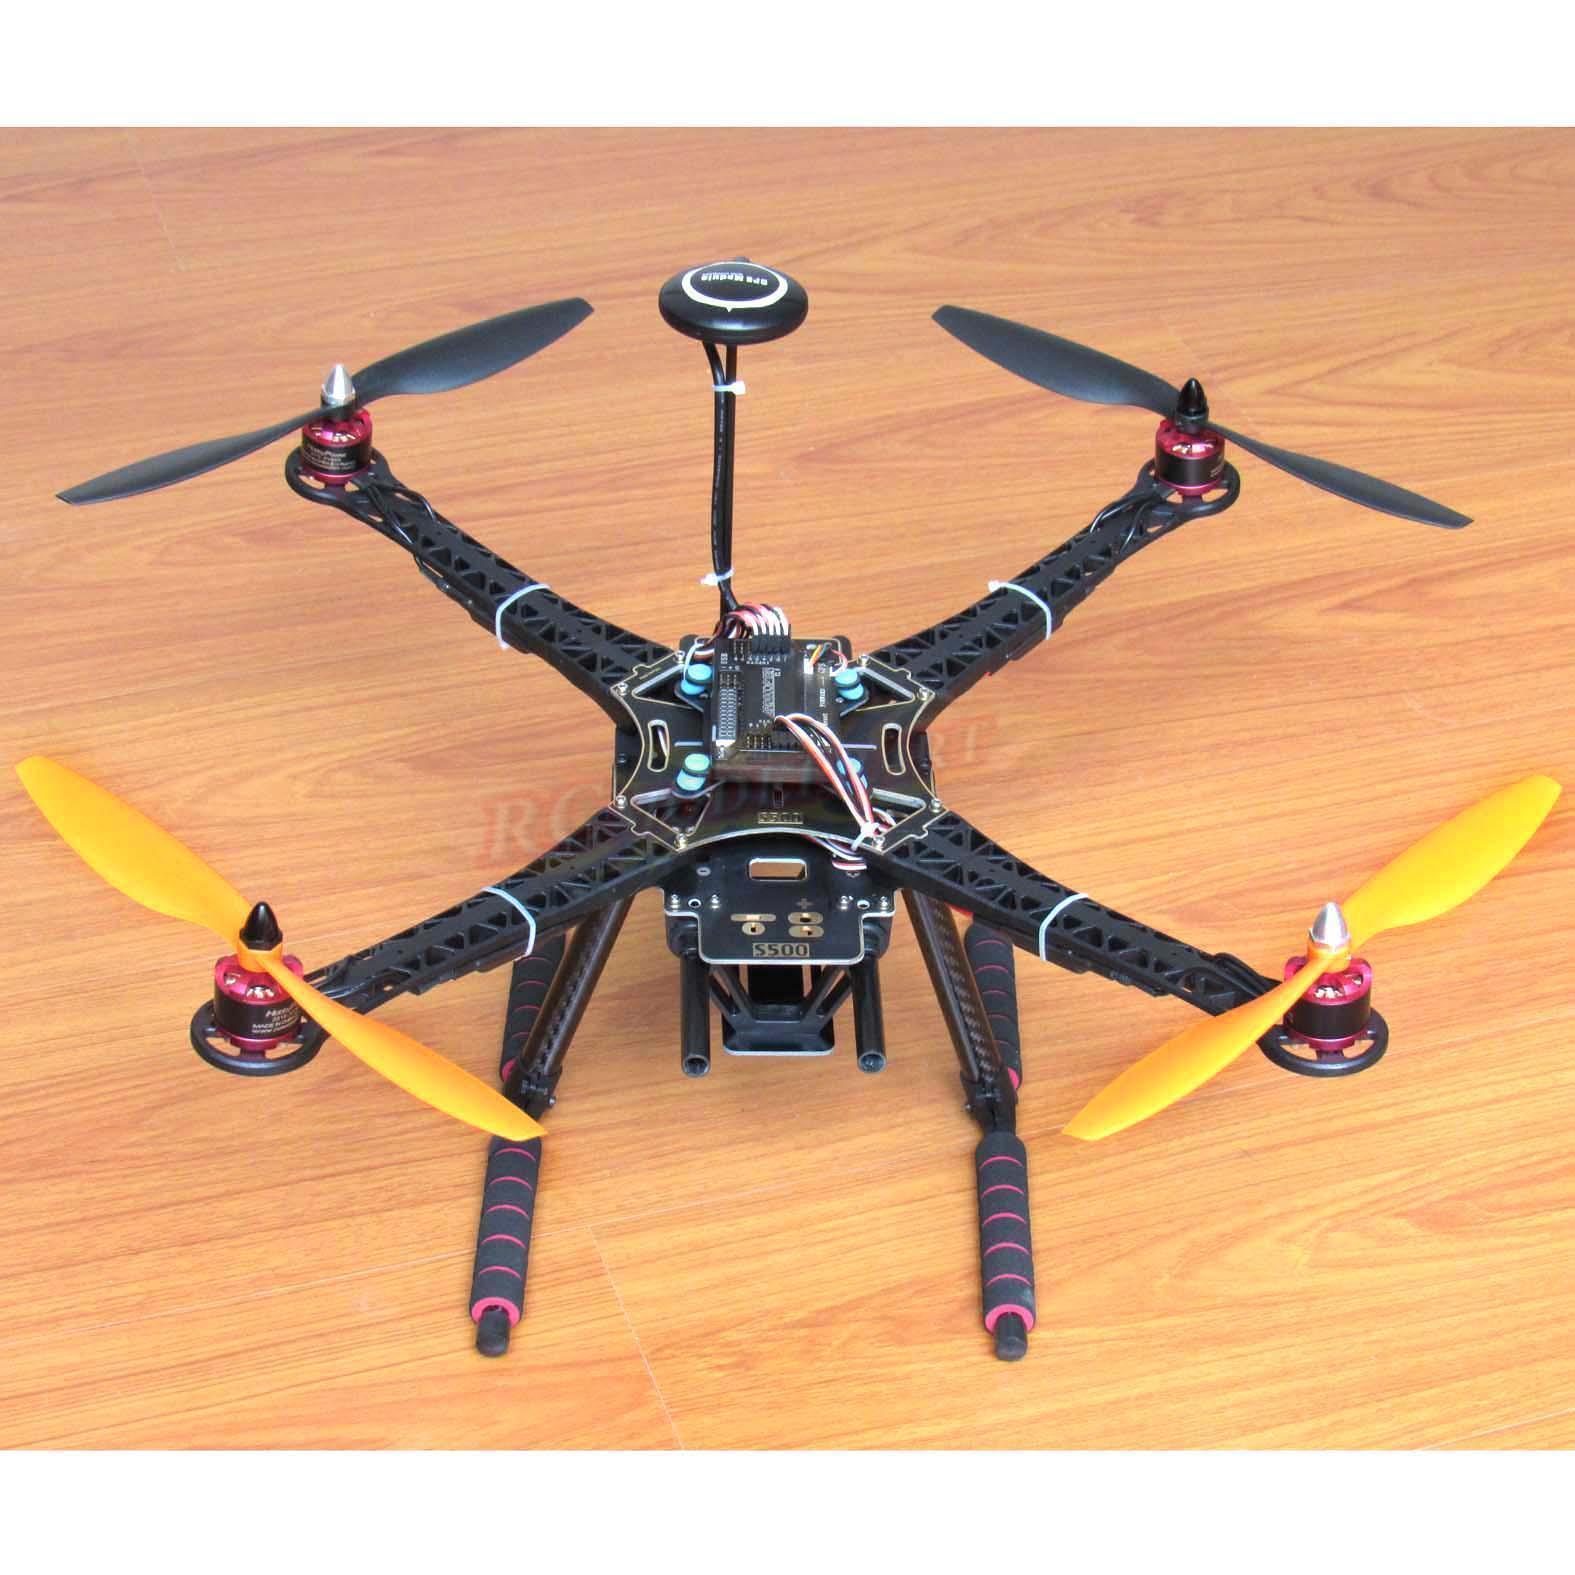 DIY S500 Quadcopter APM2.8 FC NEO-7M GPS HP2212 HP2212 HP2212 920KV BL Motor Simonk 30A ESC 6ab646